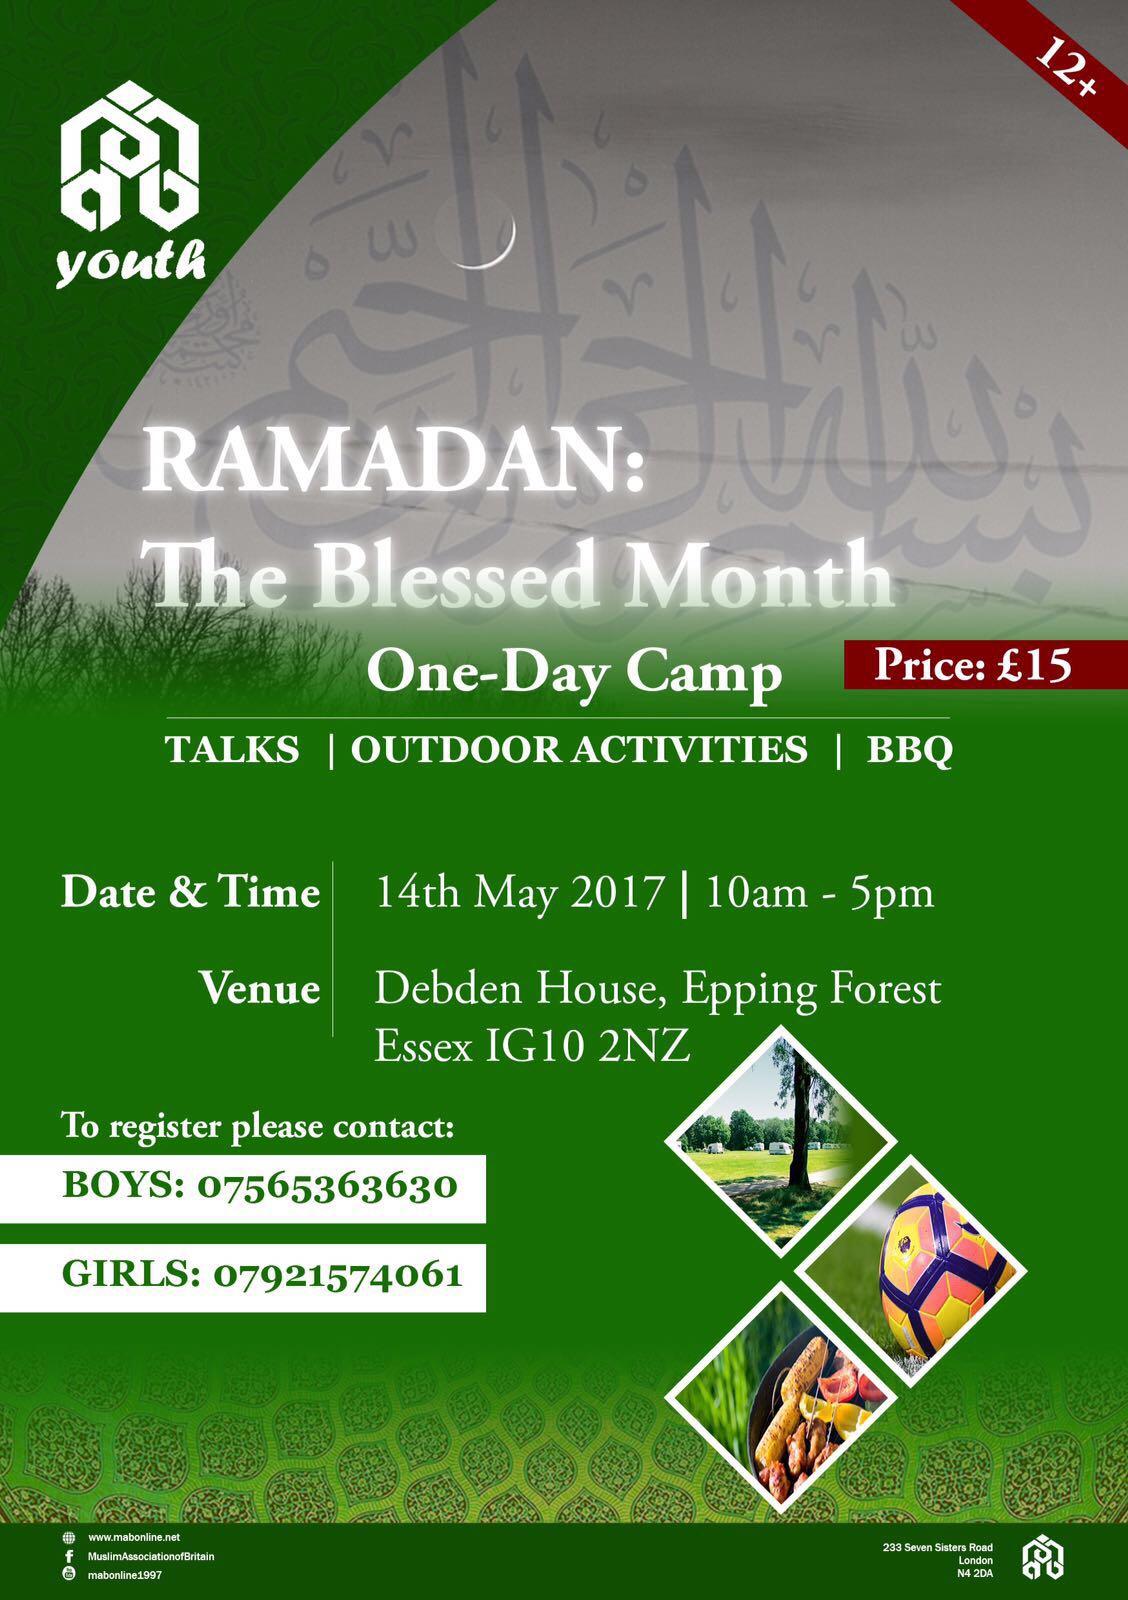 Prepare Ramadan - One-Day Camp